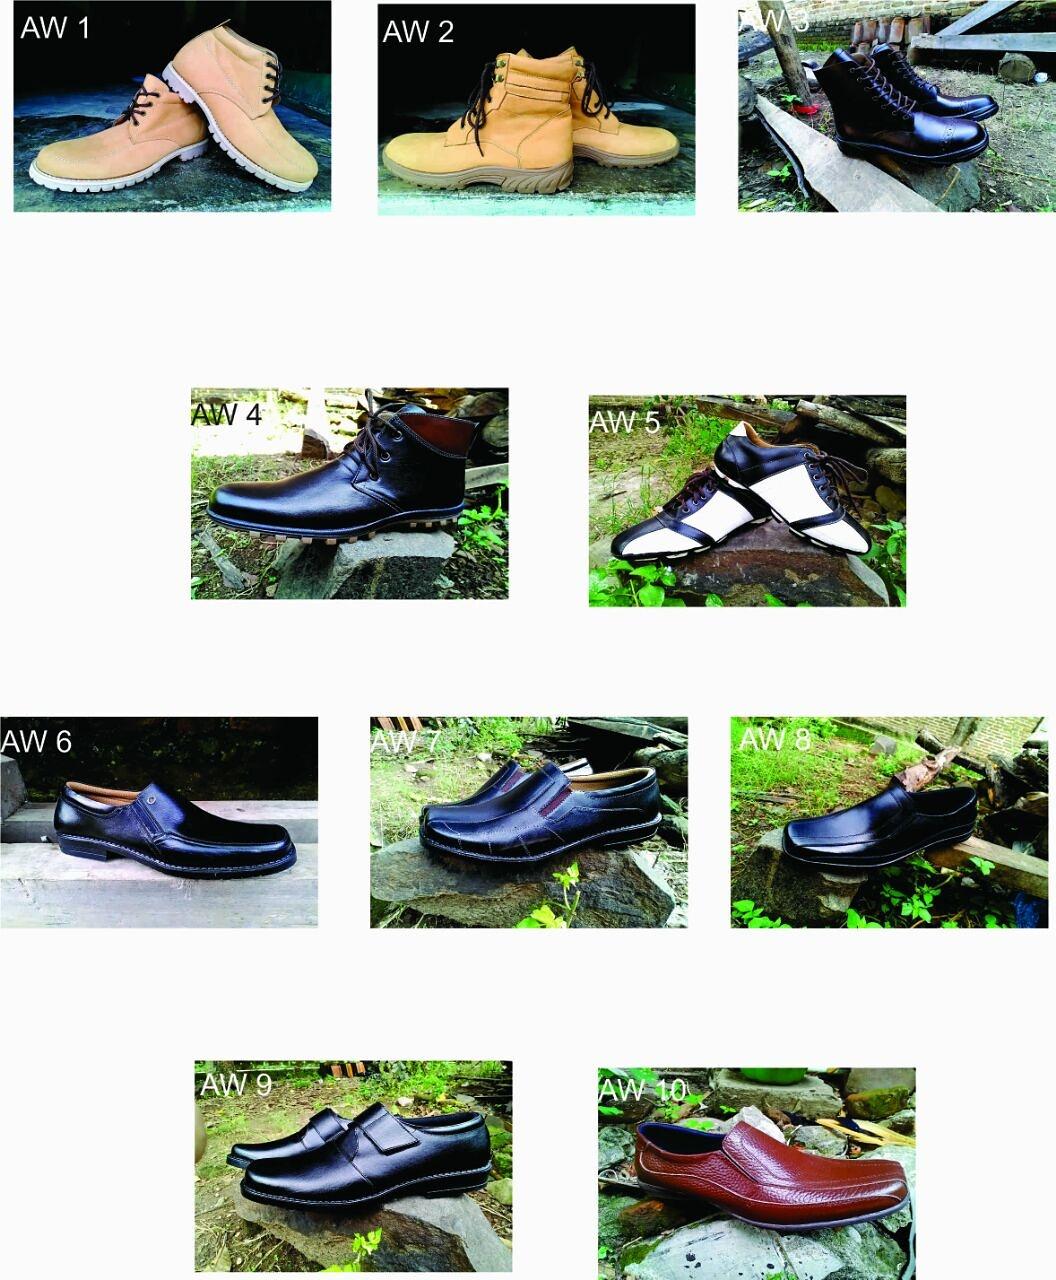 Agen | Grosir Sepatu Kulit Asli Magetan | Surabaya